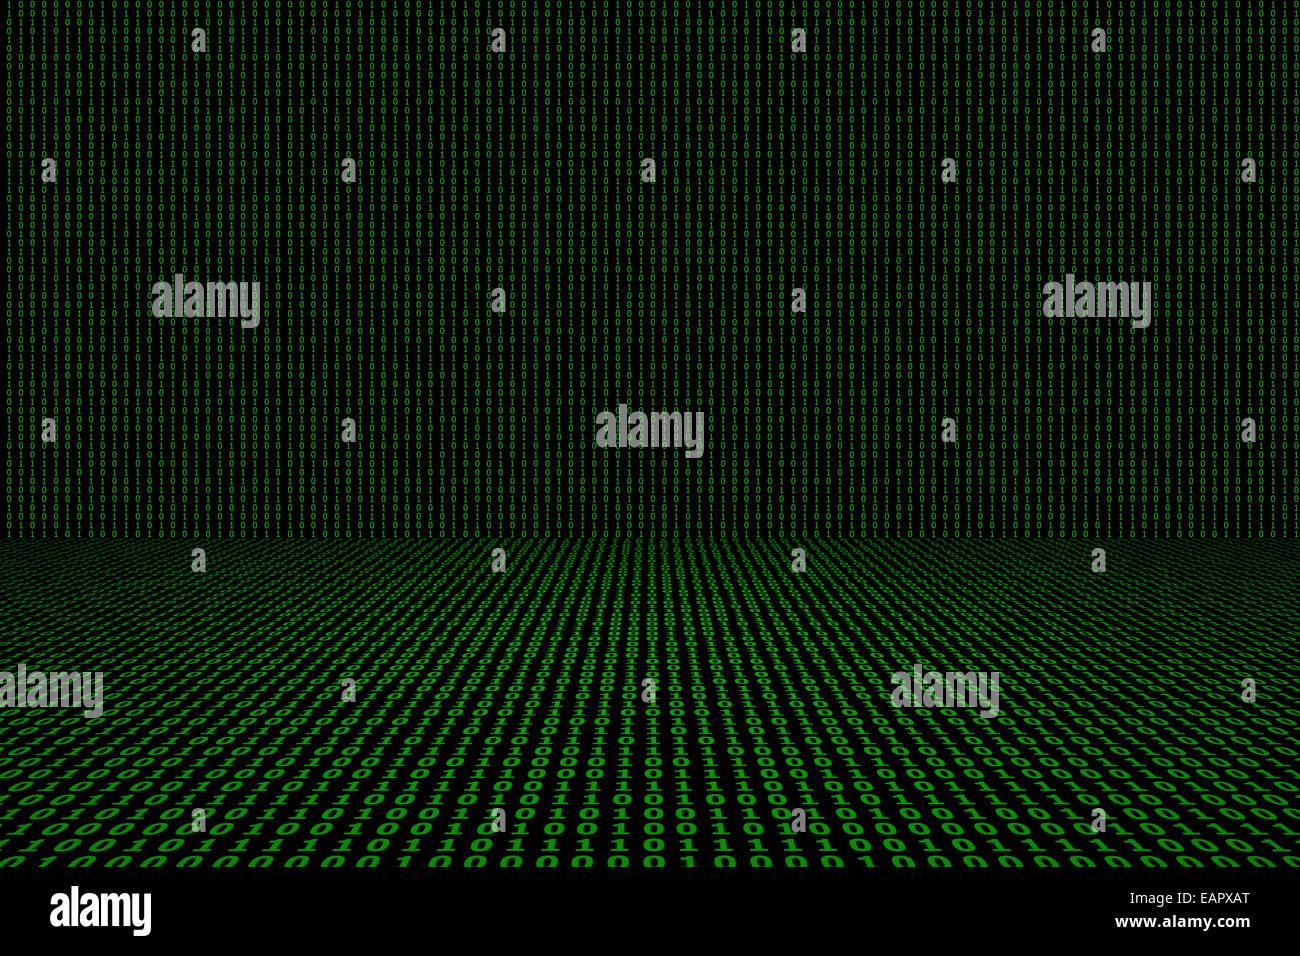 Binary computer code green background. - Stock Image